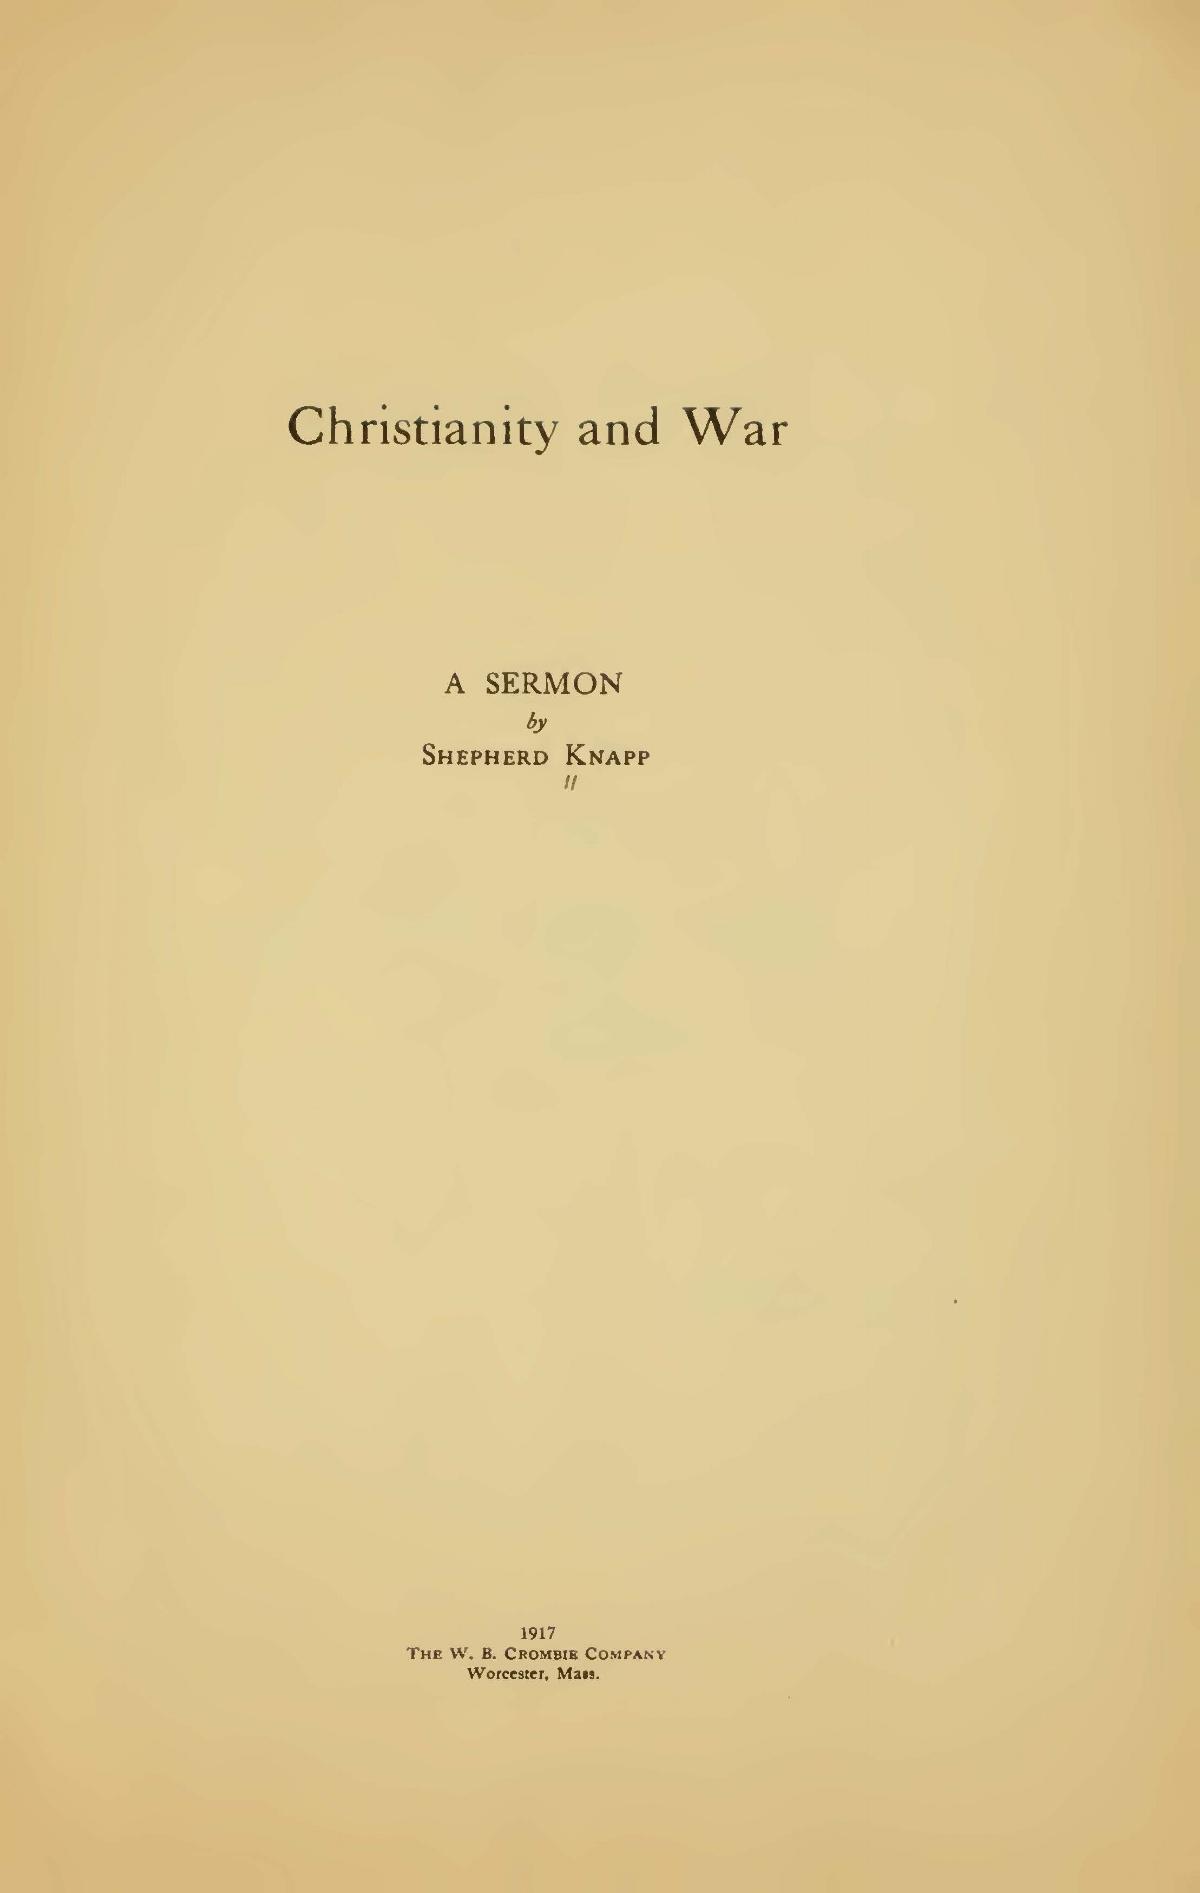 Knapp, Jr., Shepherd, Christianity and War Title Page.jpg